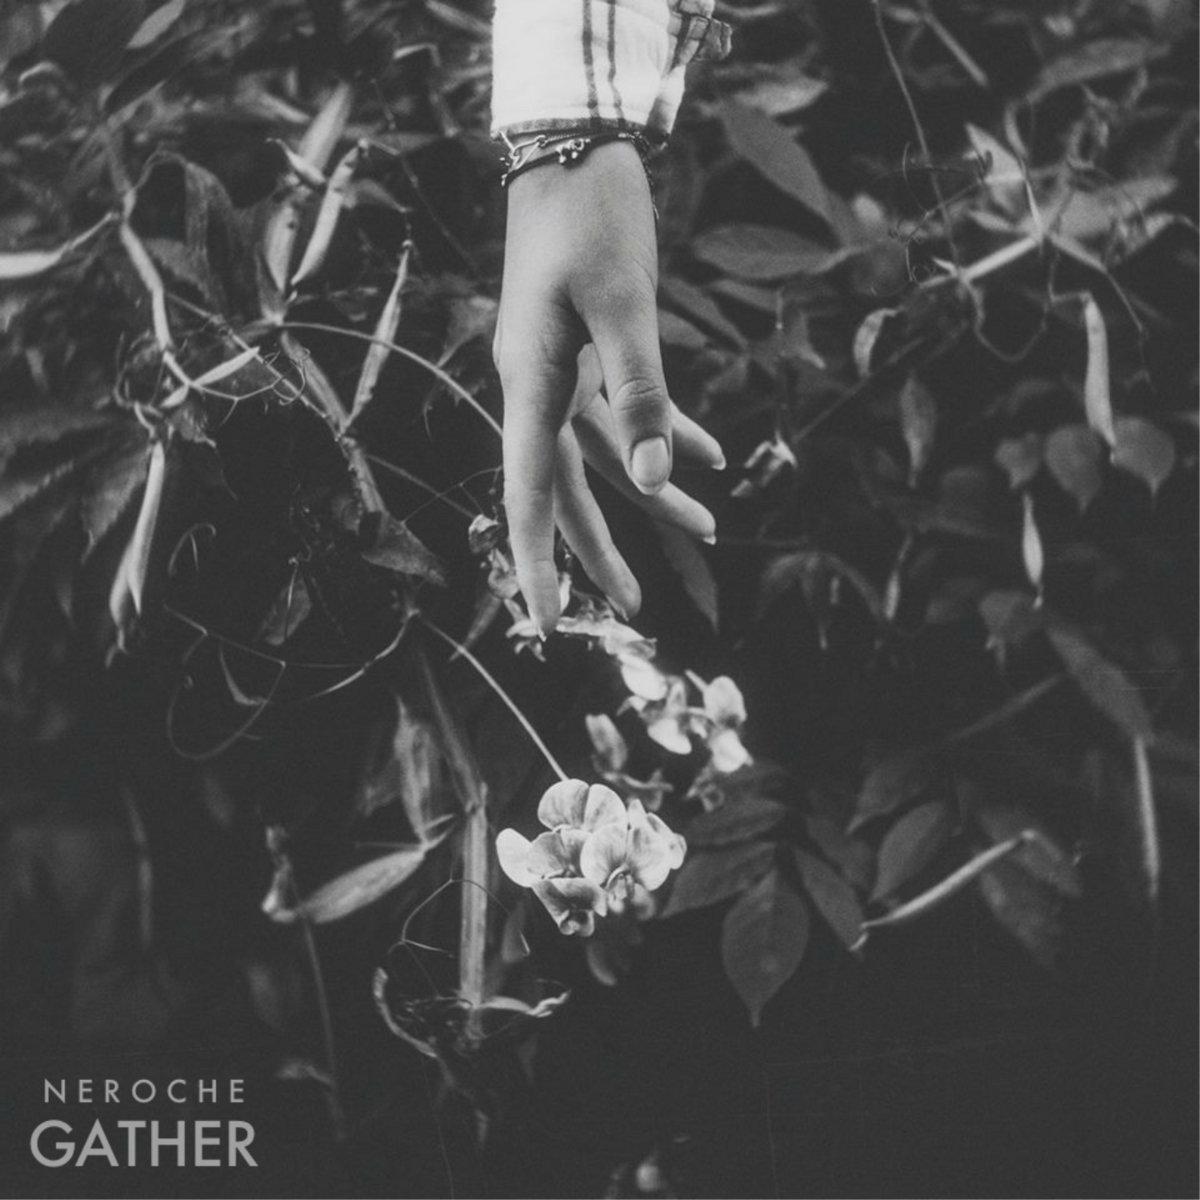 Neroche - Gather (2016)